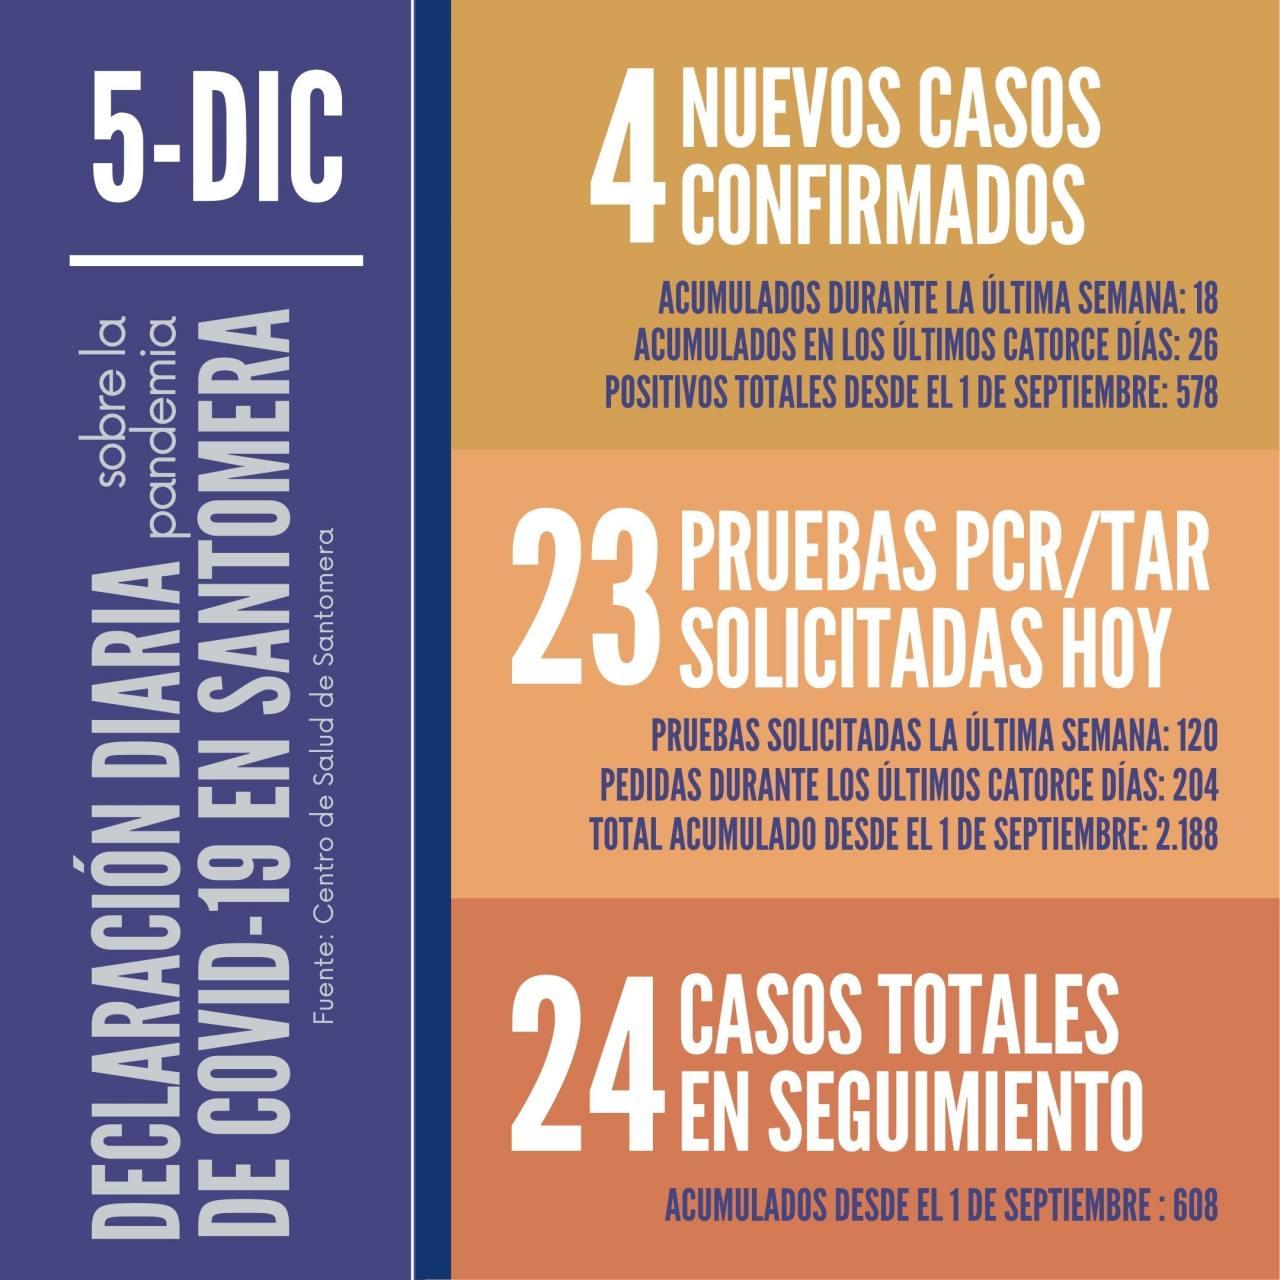 20201205_Datos-COVID-19-Santomera